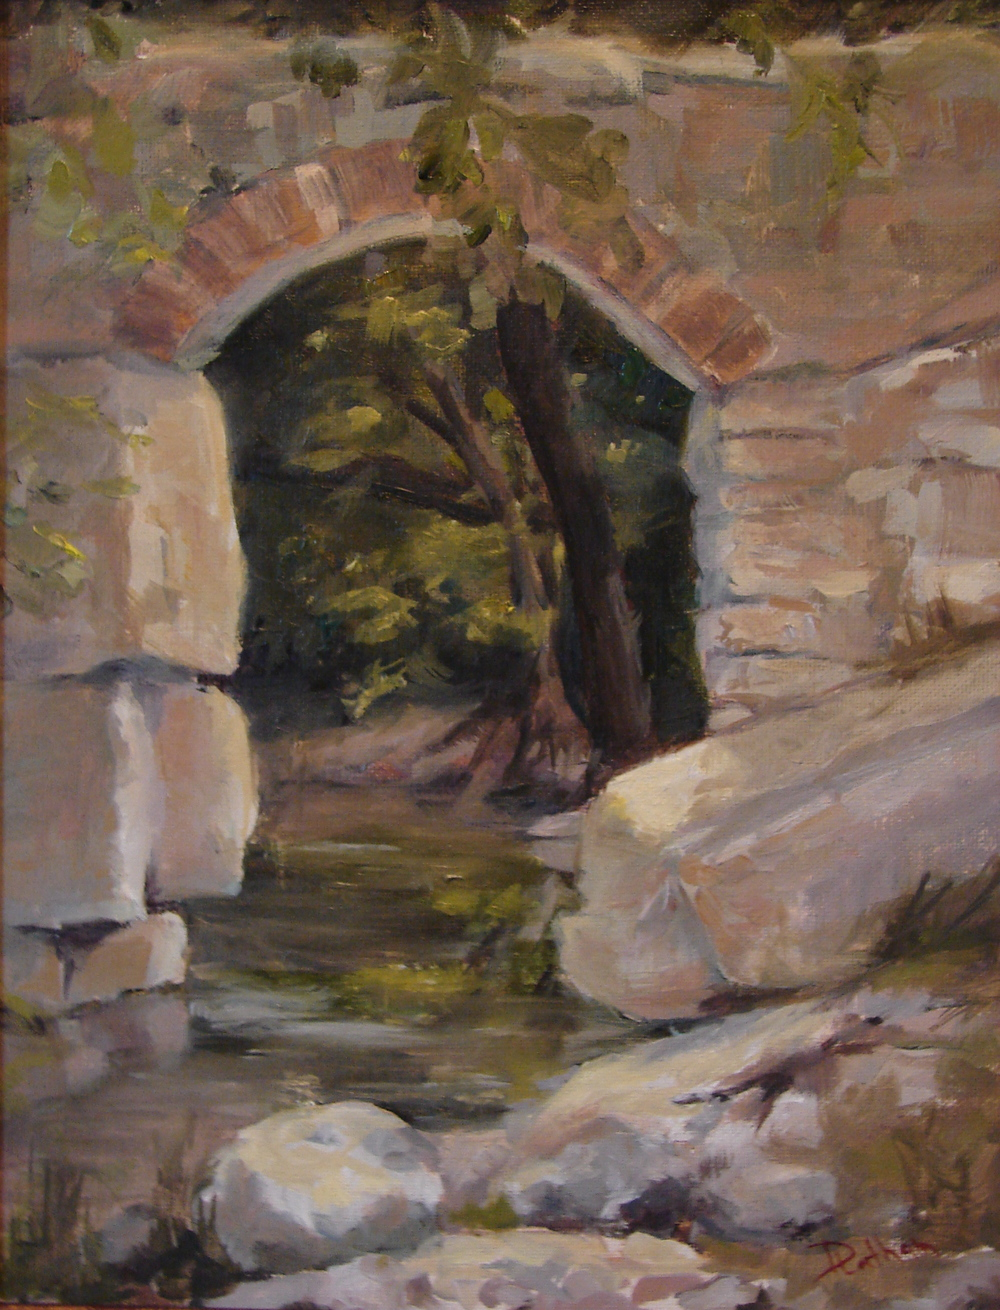 Debra Latham  Creek Under 5th  14X11  Oil on Canvas